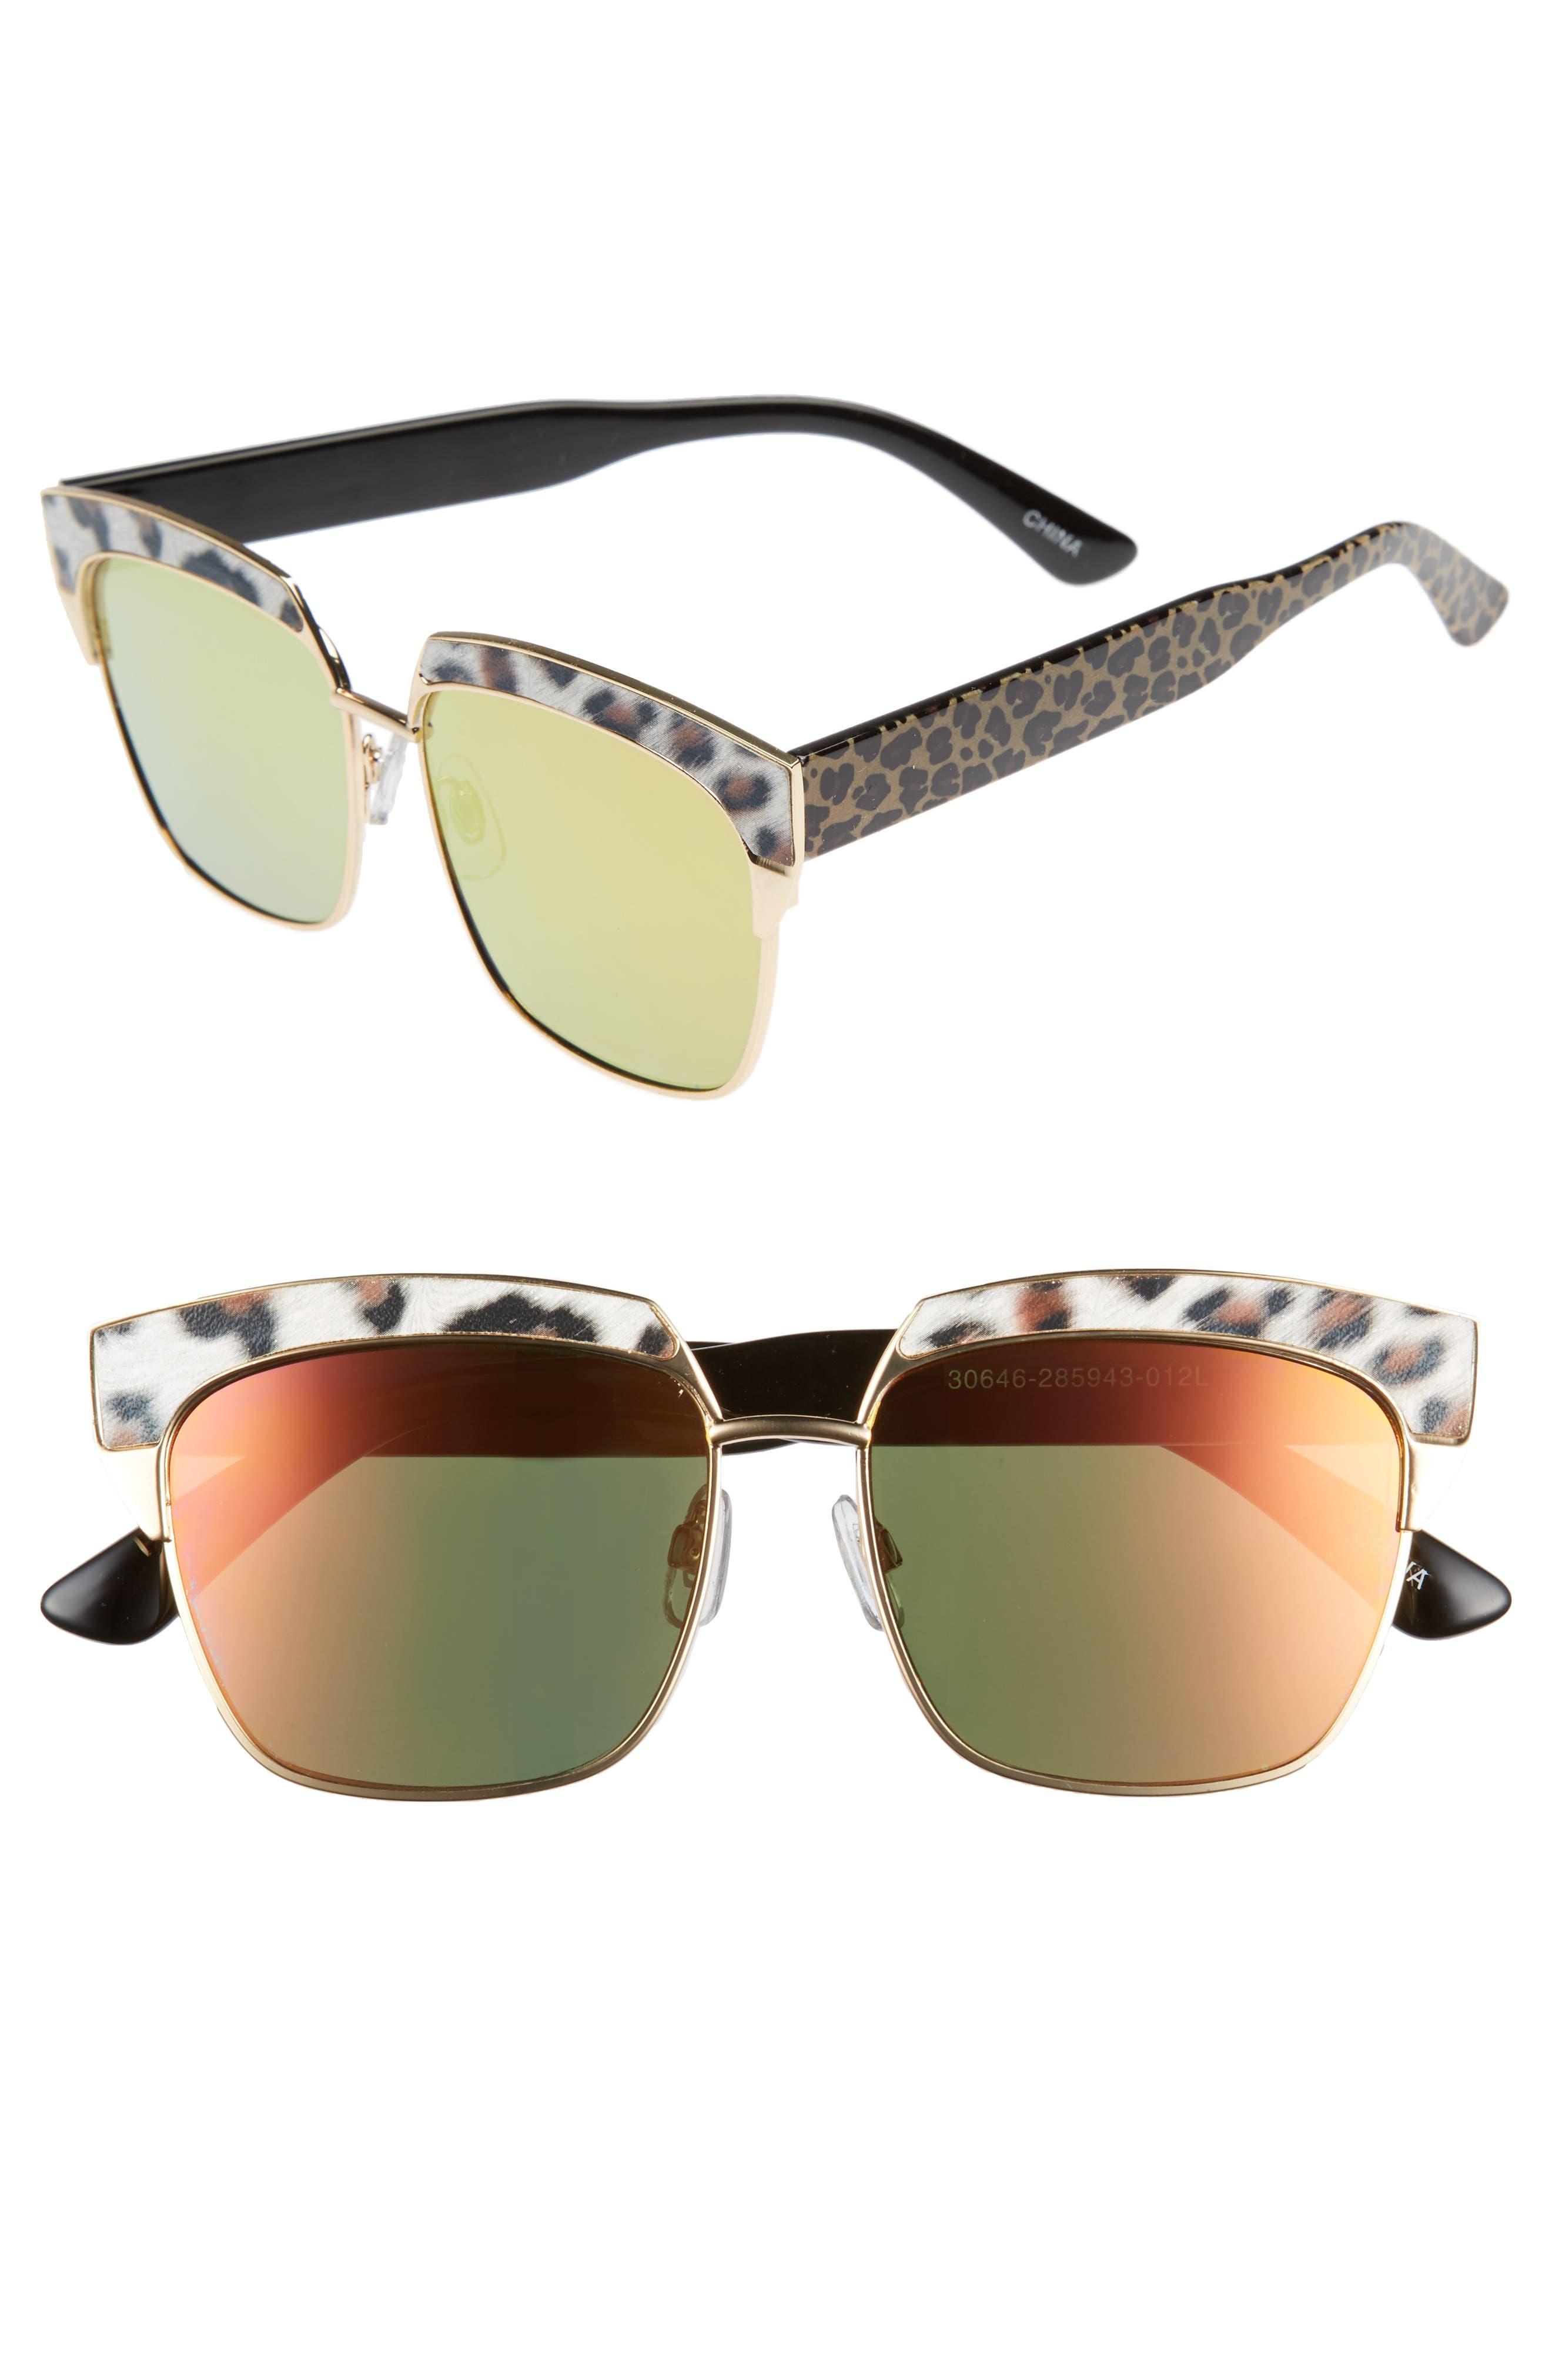 Leopard Print Top Bar Sunglasses,                         Main,                         color, Multi/ Gold